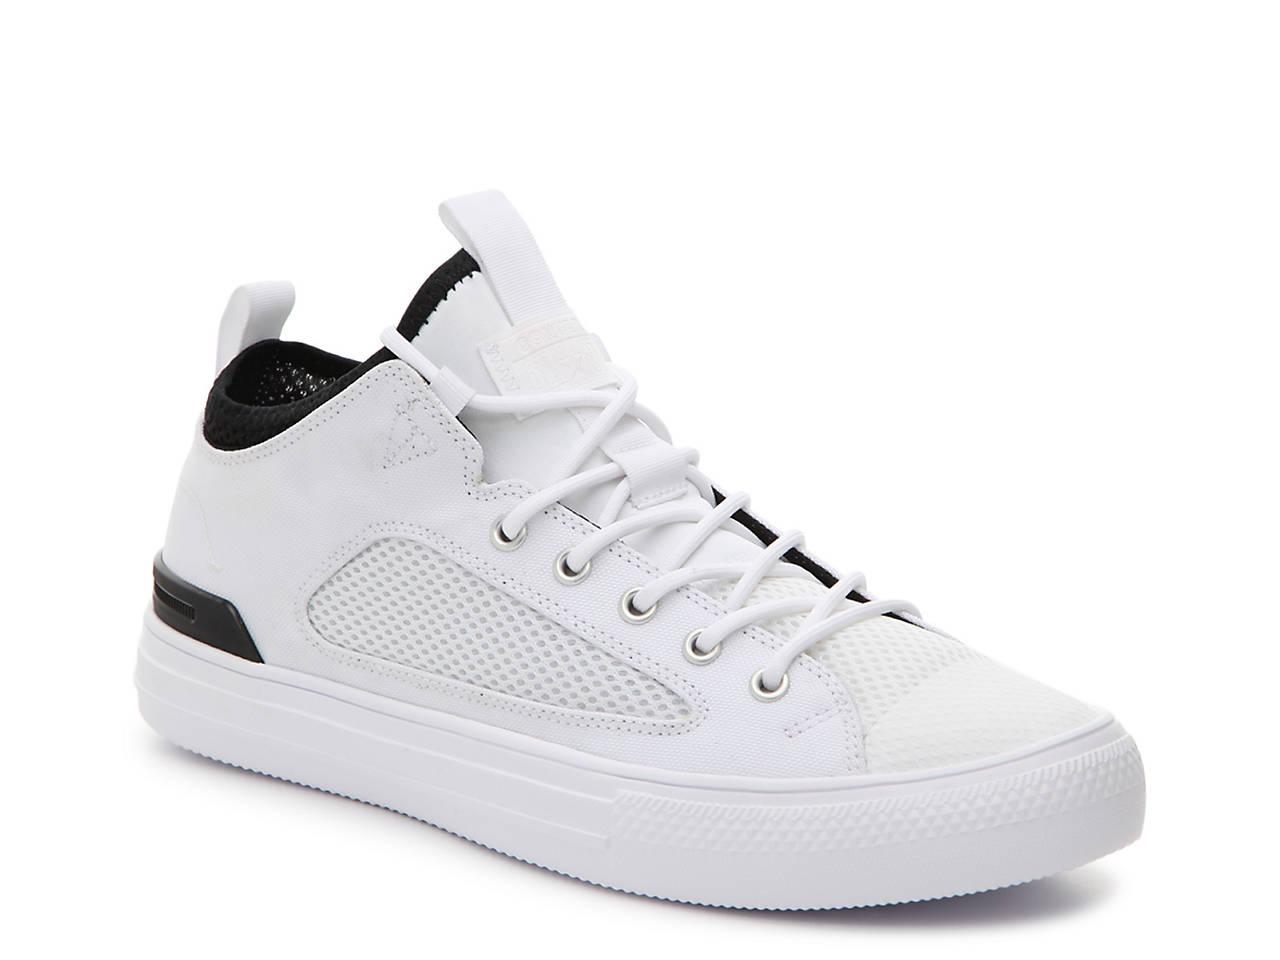 Converse Chuck Taylor All Star Ultra Lite Mid-Top Sneaker - Men s ... f4bfce48e8d